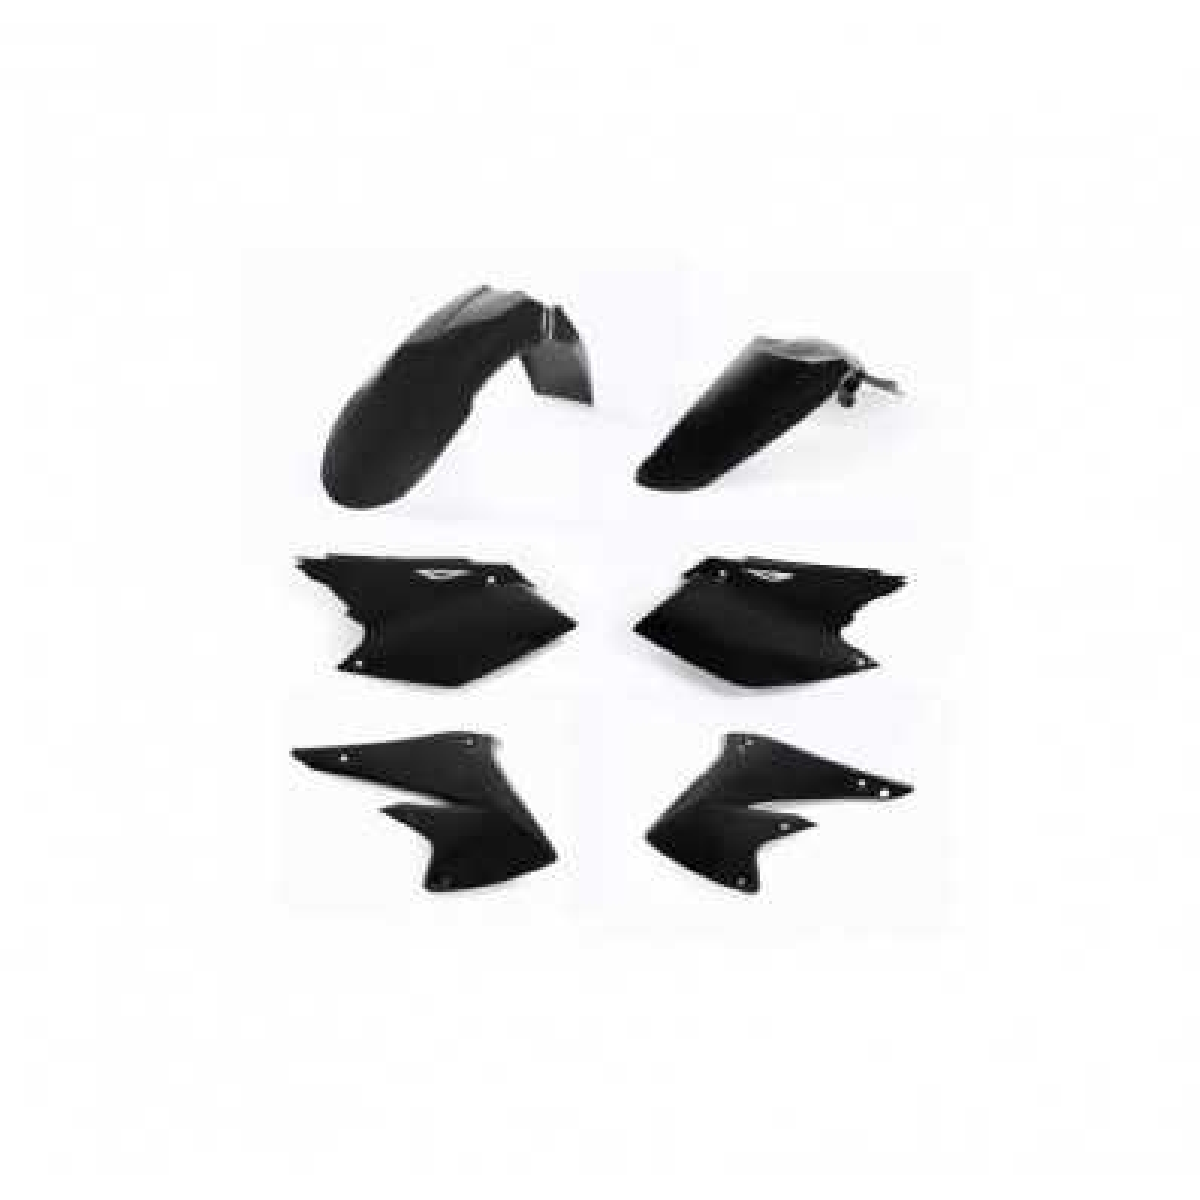 0011647-090 - Kit Plasticos Rmz 450 08 17 Negro